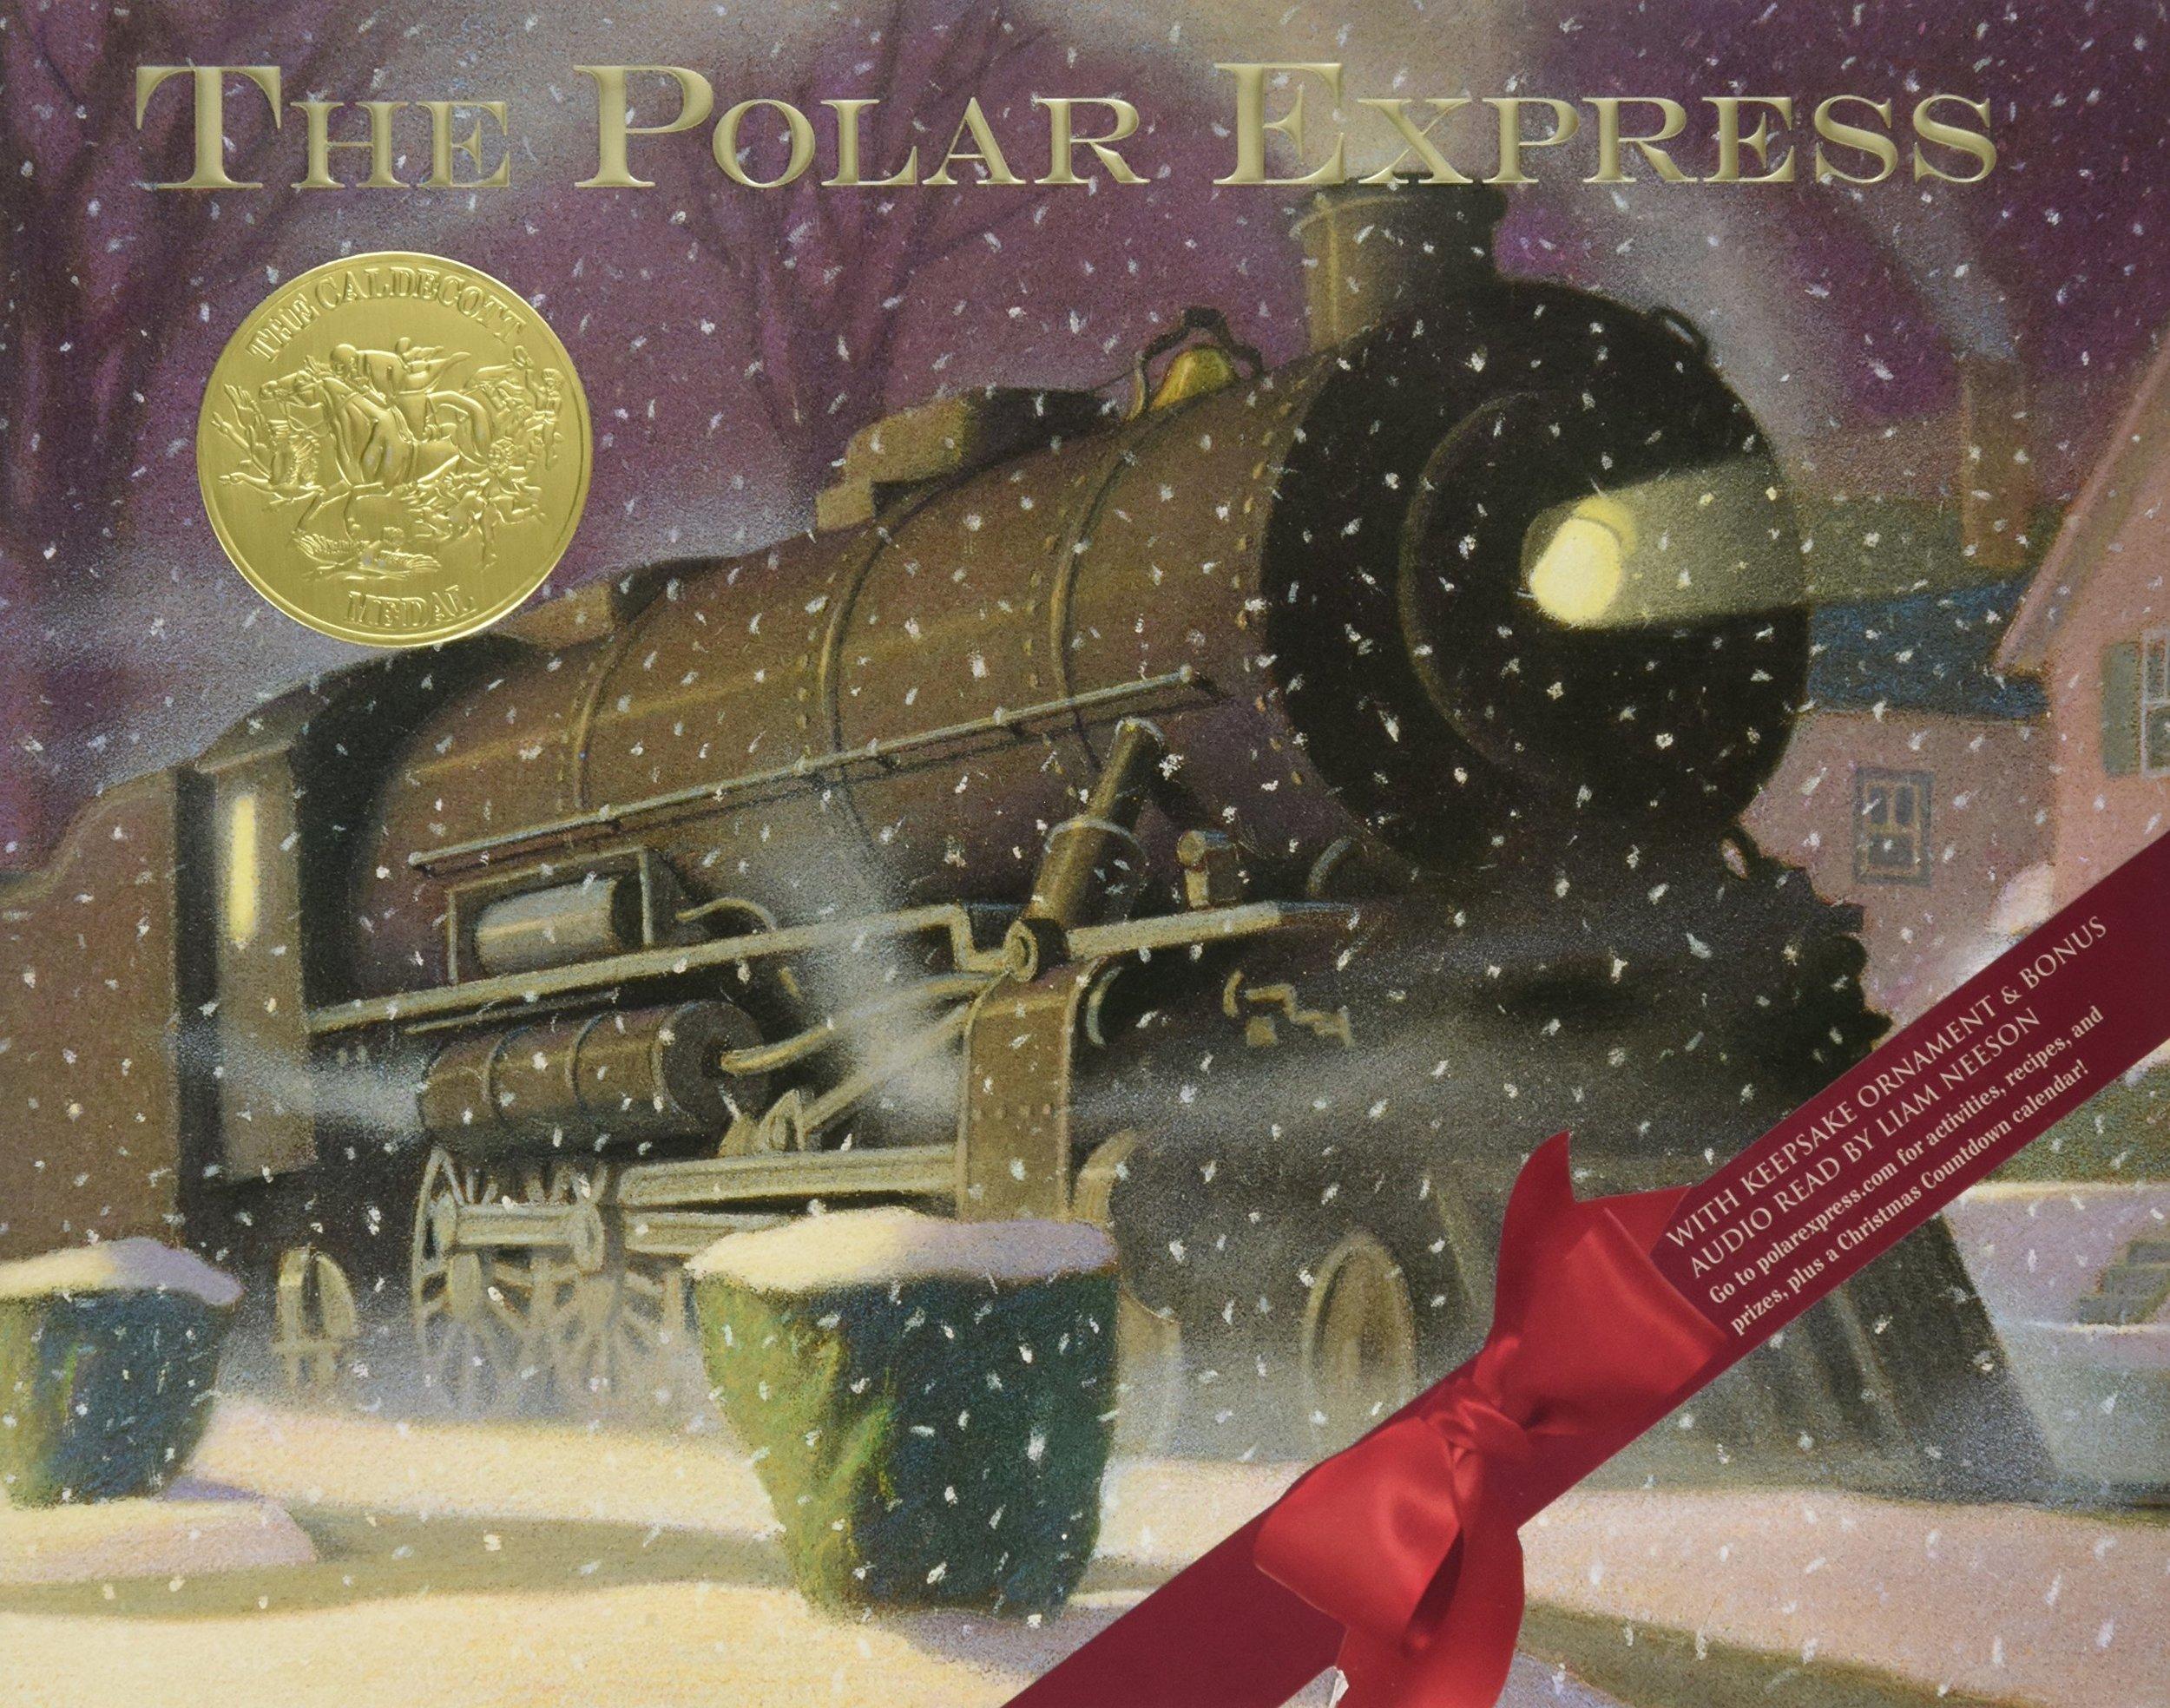 shegotguts - christmas books -polar express.jpg